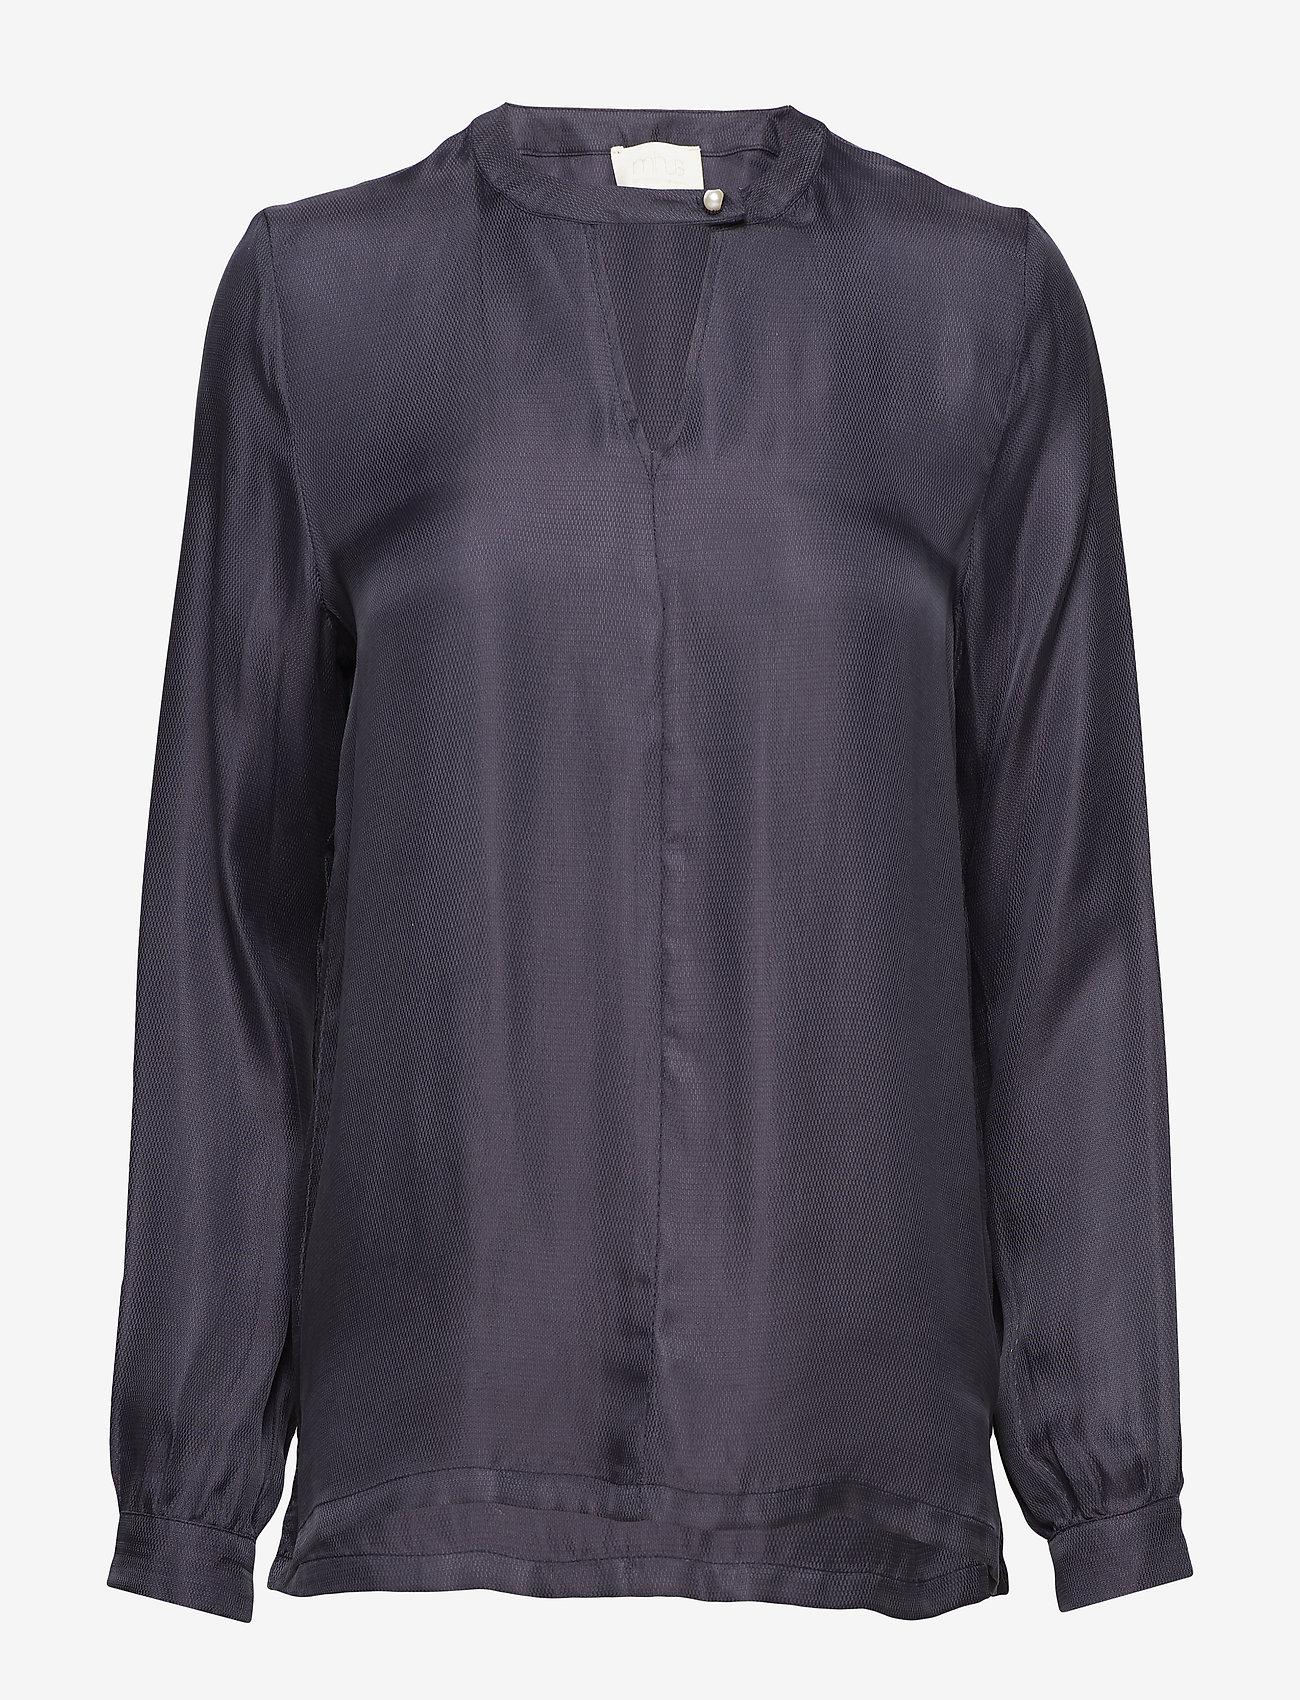 Minus Everly blouse - Blouses & Shirts BLACK IRIS